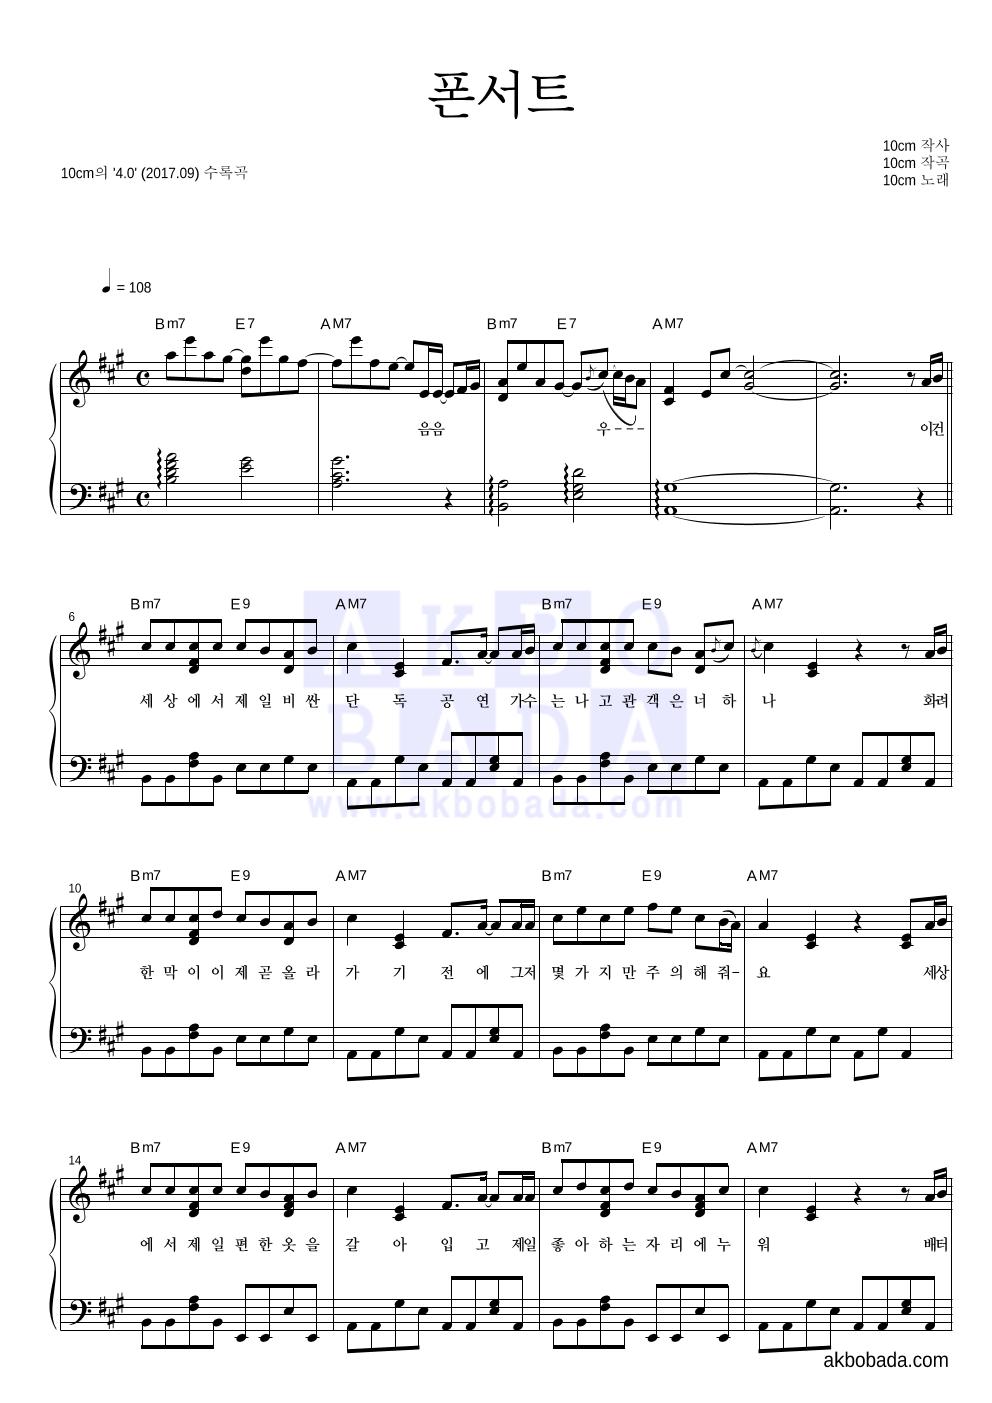 10CM - 폰서트 피아노 2단 악보